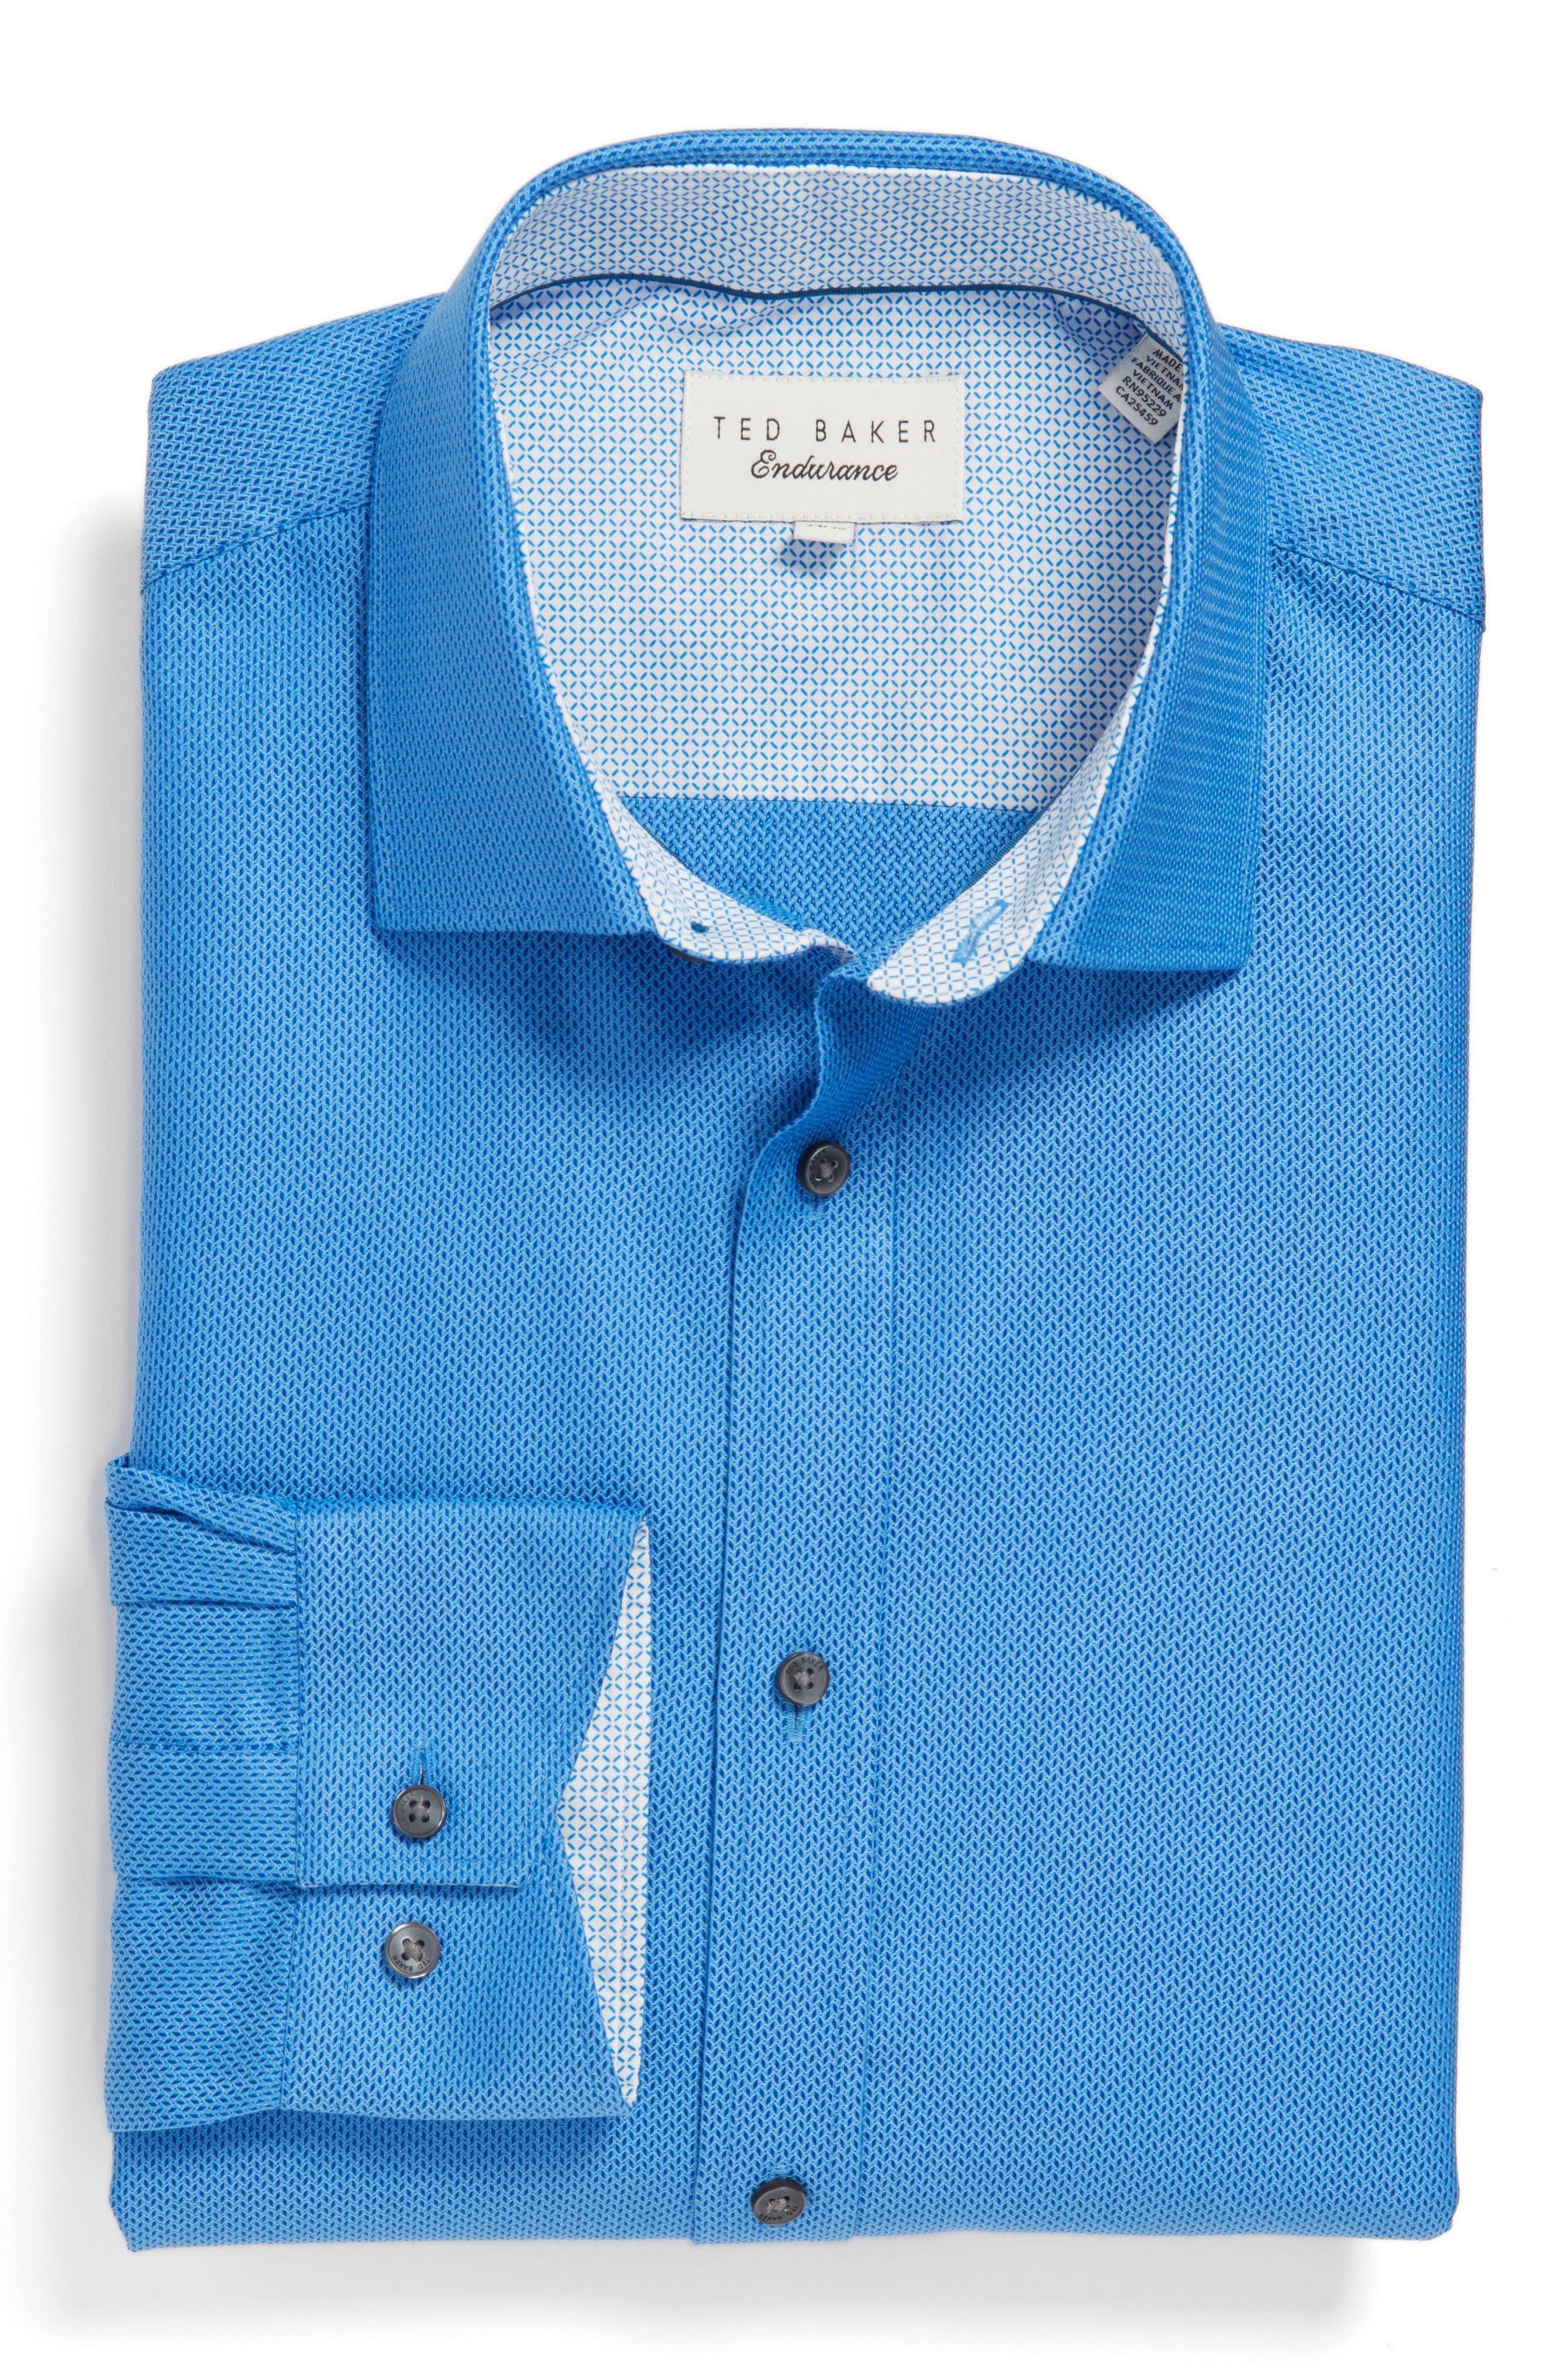 Alternate Image 4  - Ted Baker London Endurance Trim Fit Geometric Dress Shirt